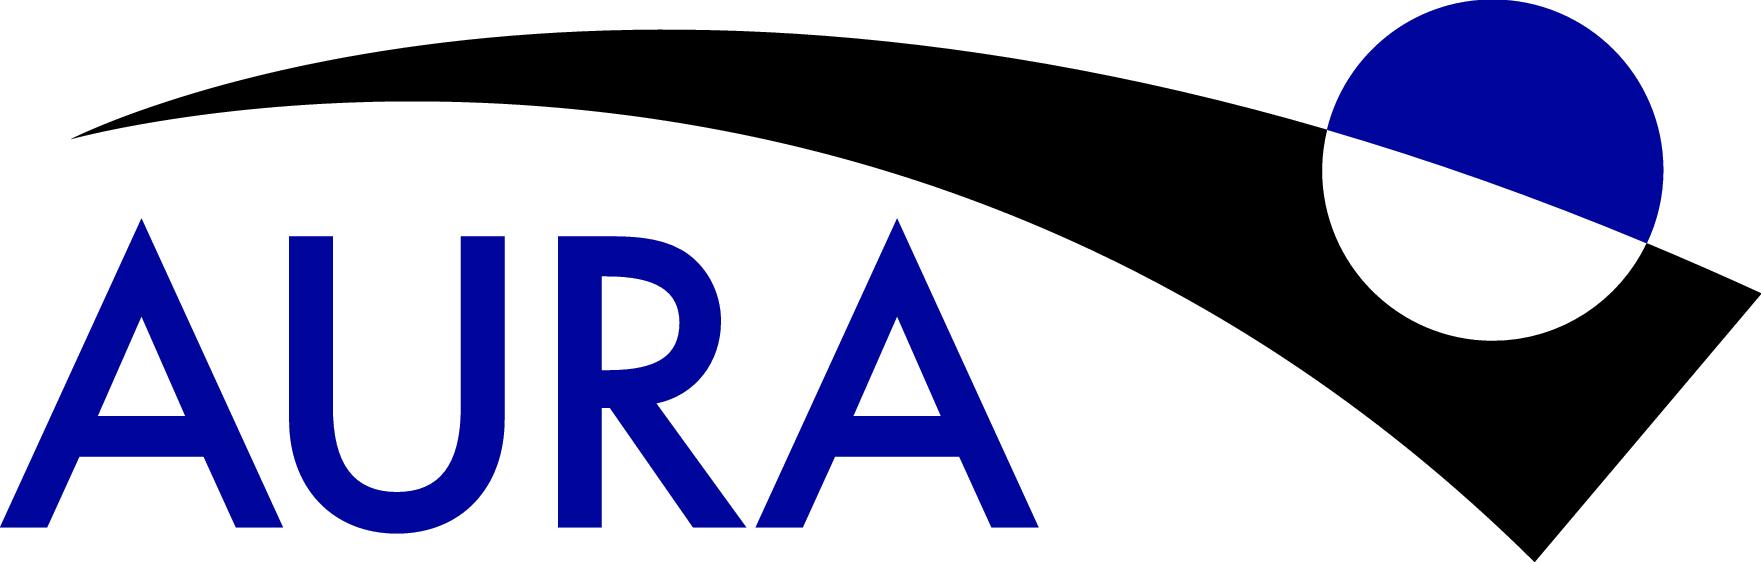 aura_logo_light_background (1)